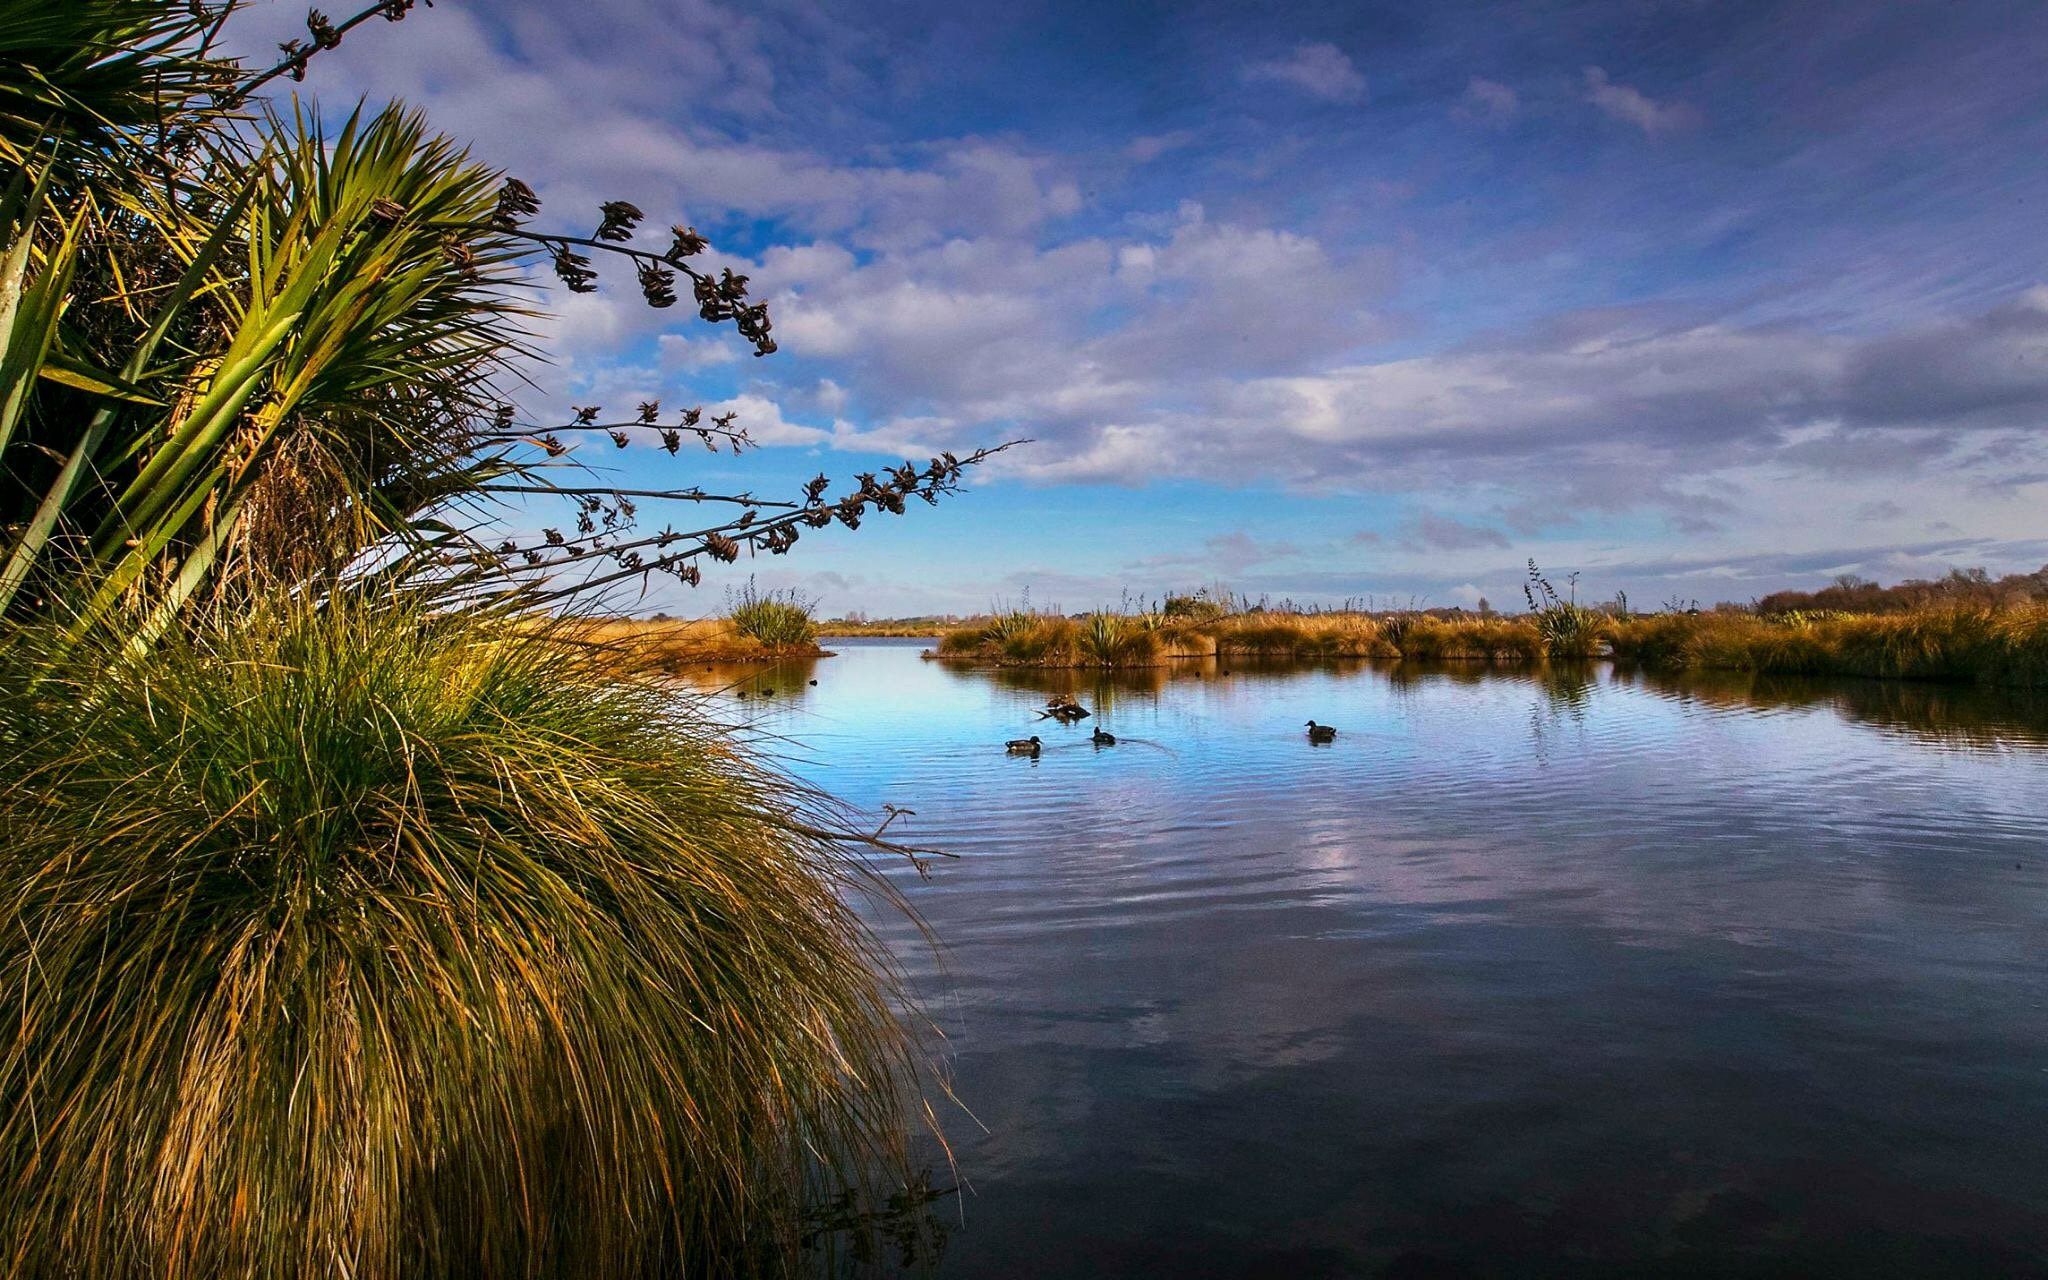 The Travis Wetlands are a great spot for #ConservationWeek and a #KiwiGuardians adventure https://t.co/UB2LJ6SSlF https://t.co/6BLQRU2GdU